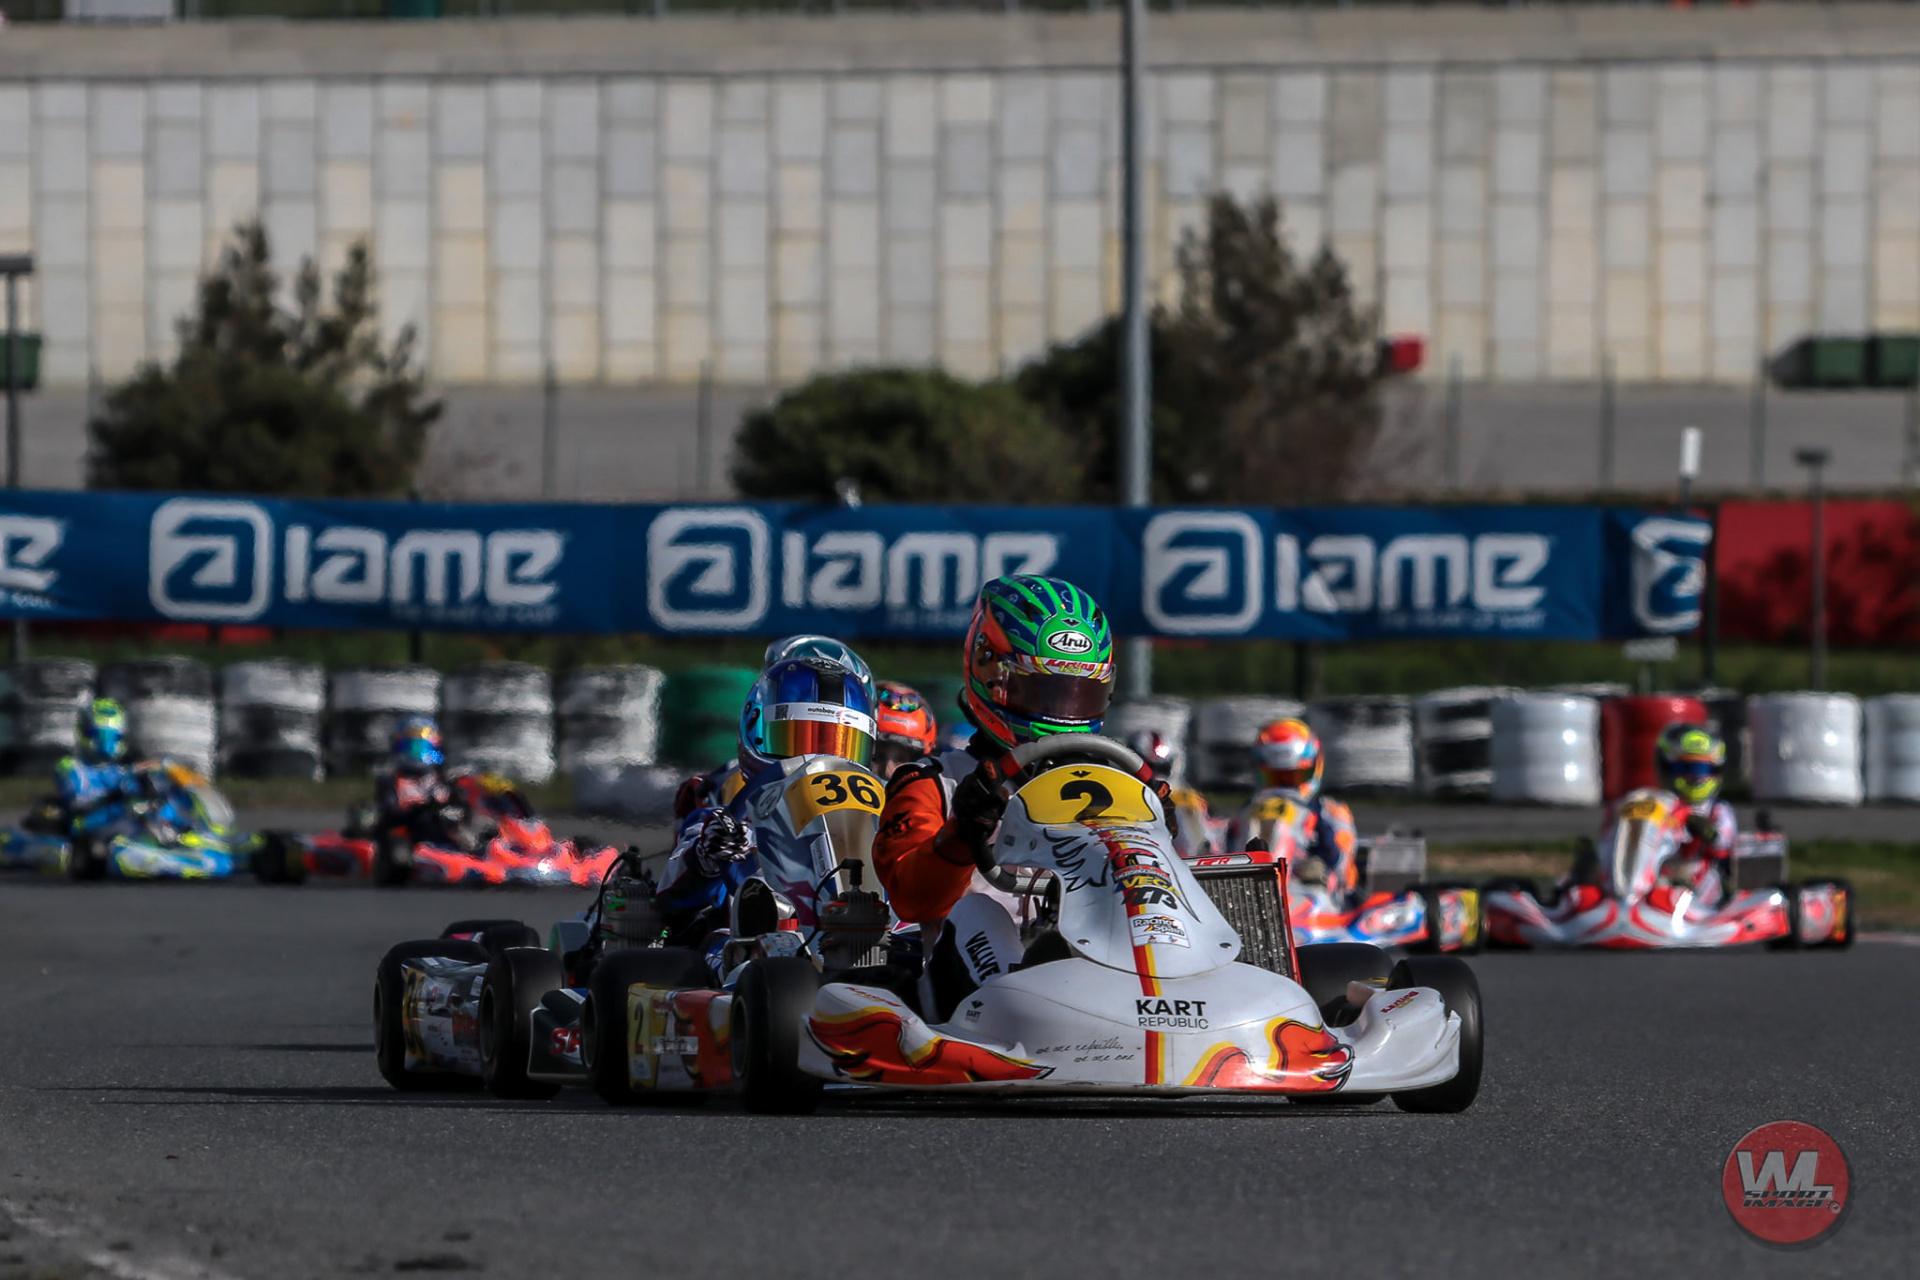 Iame International Games Junior - Top 10 para Santi Vallvé